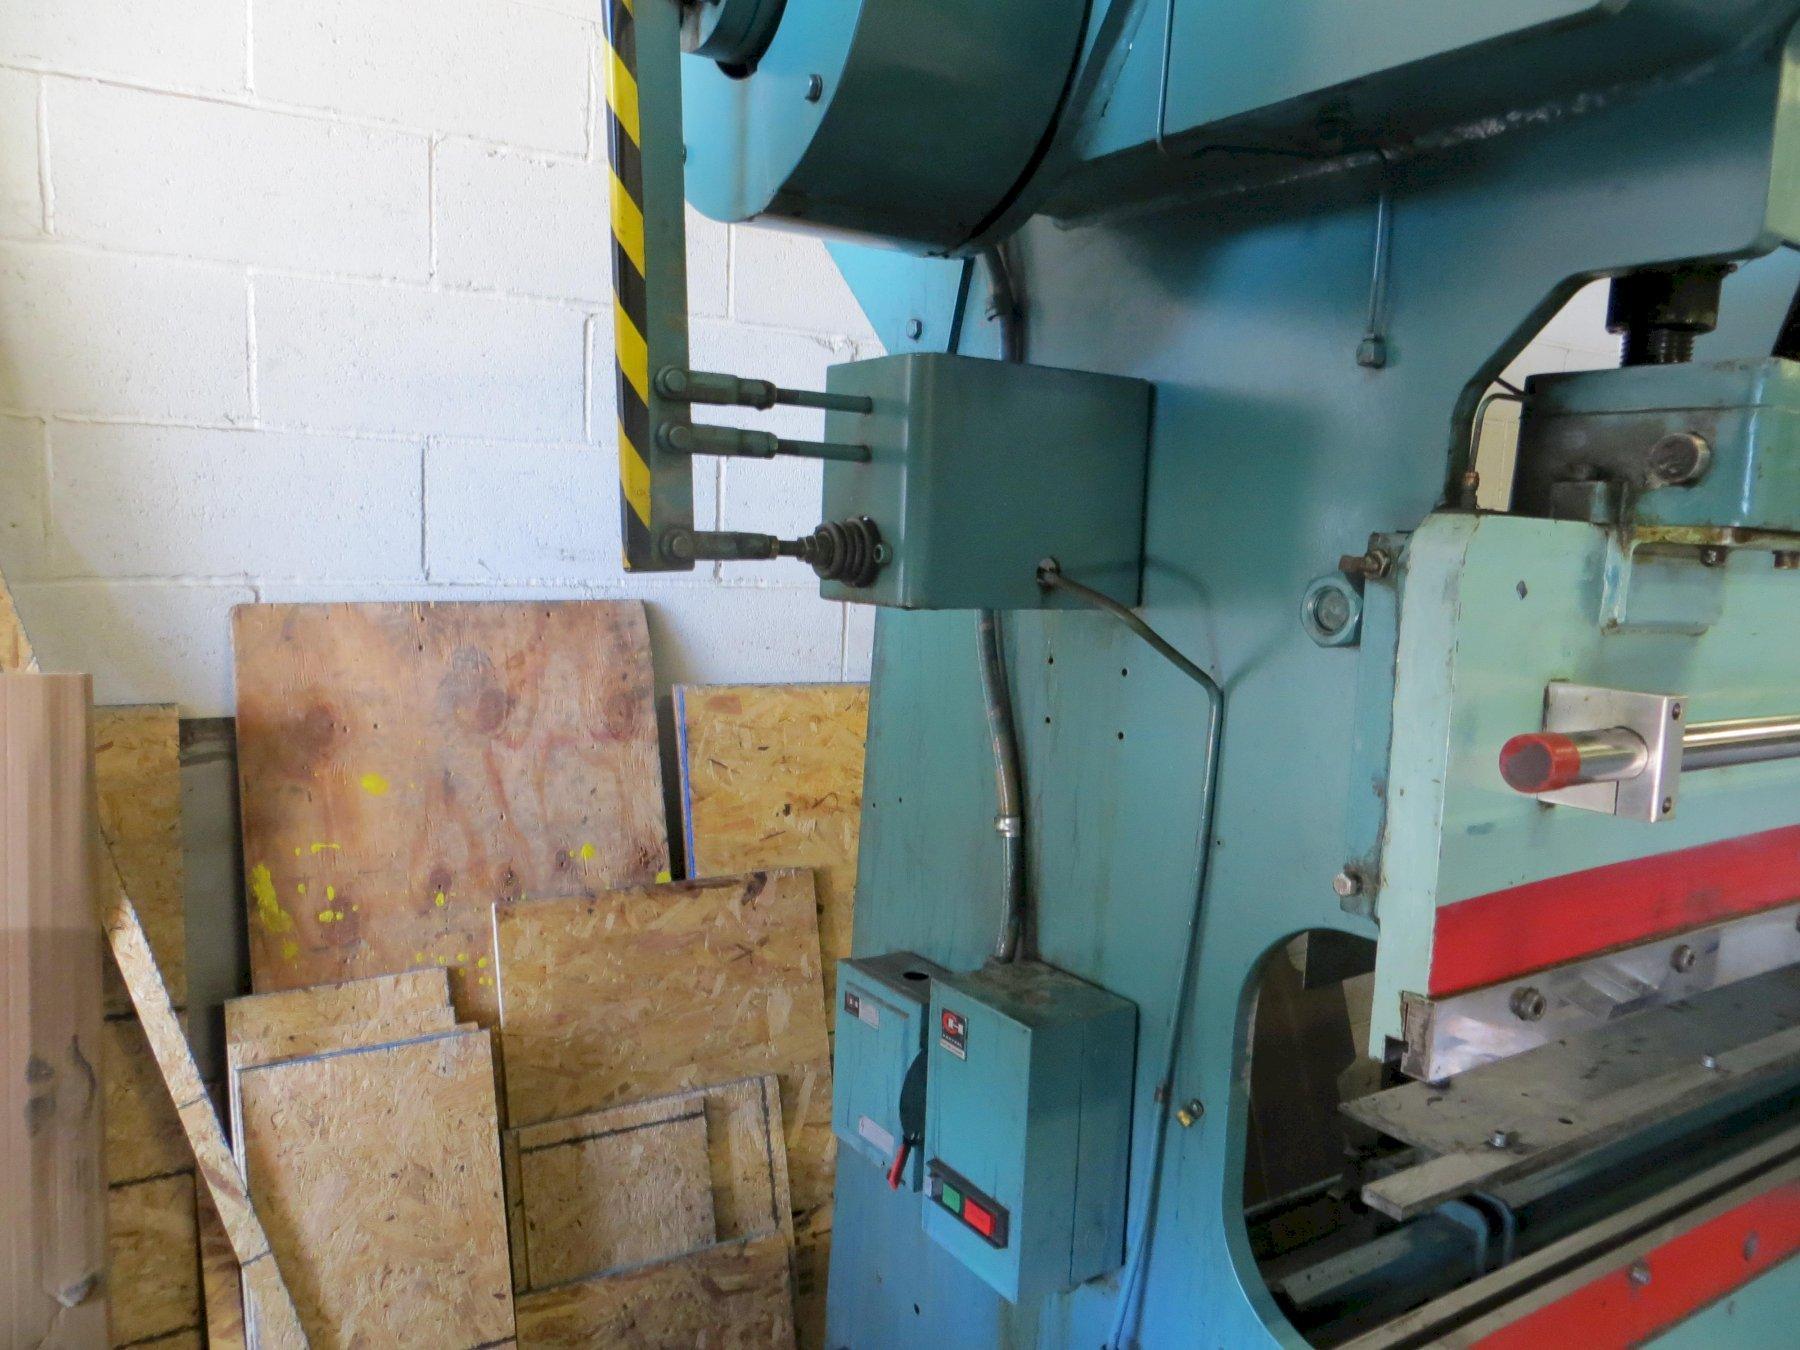 35 Ton x 6 ft, Wysong Mechanical Press Brake Model 3572